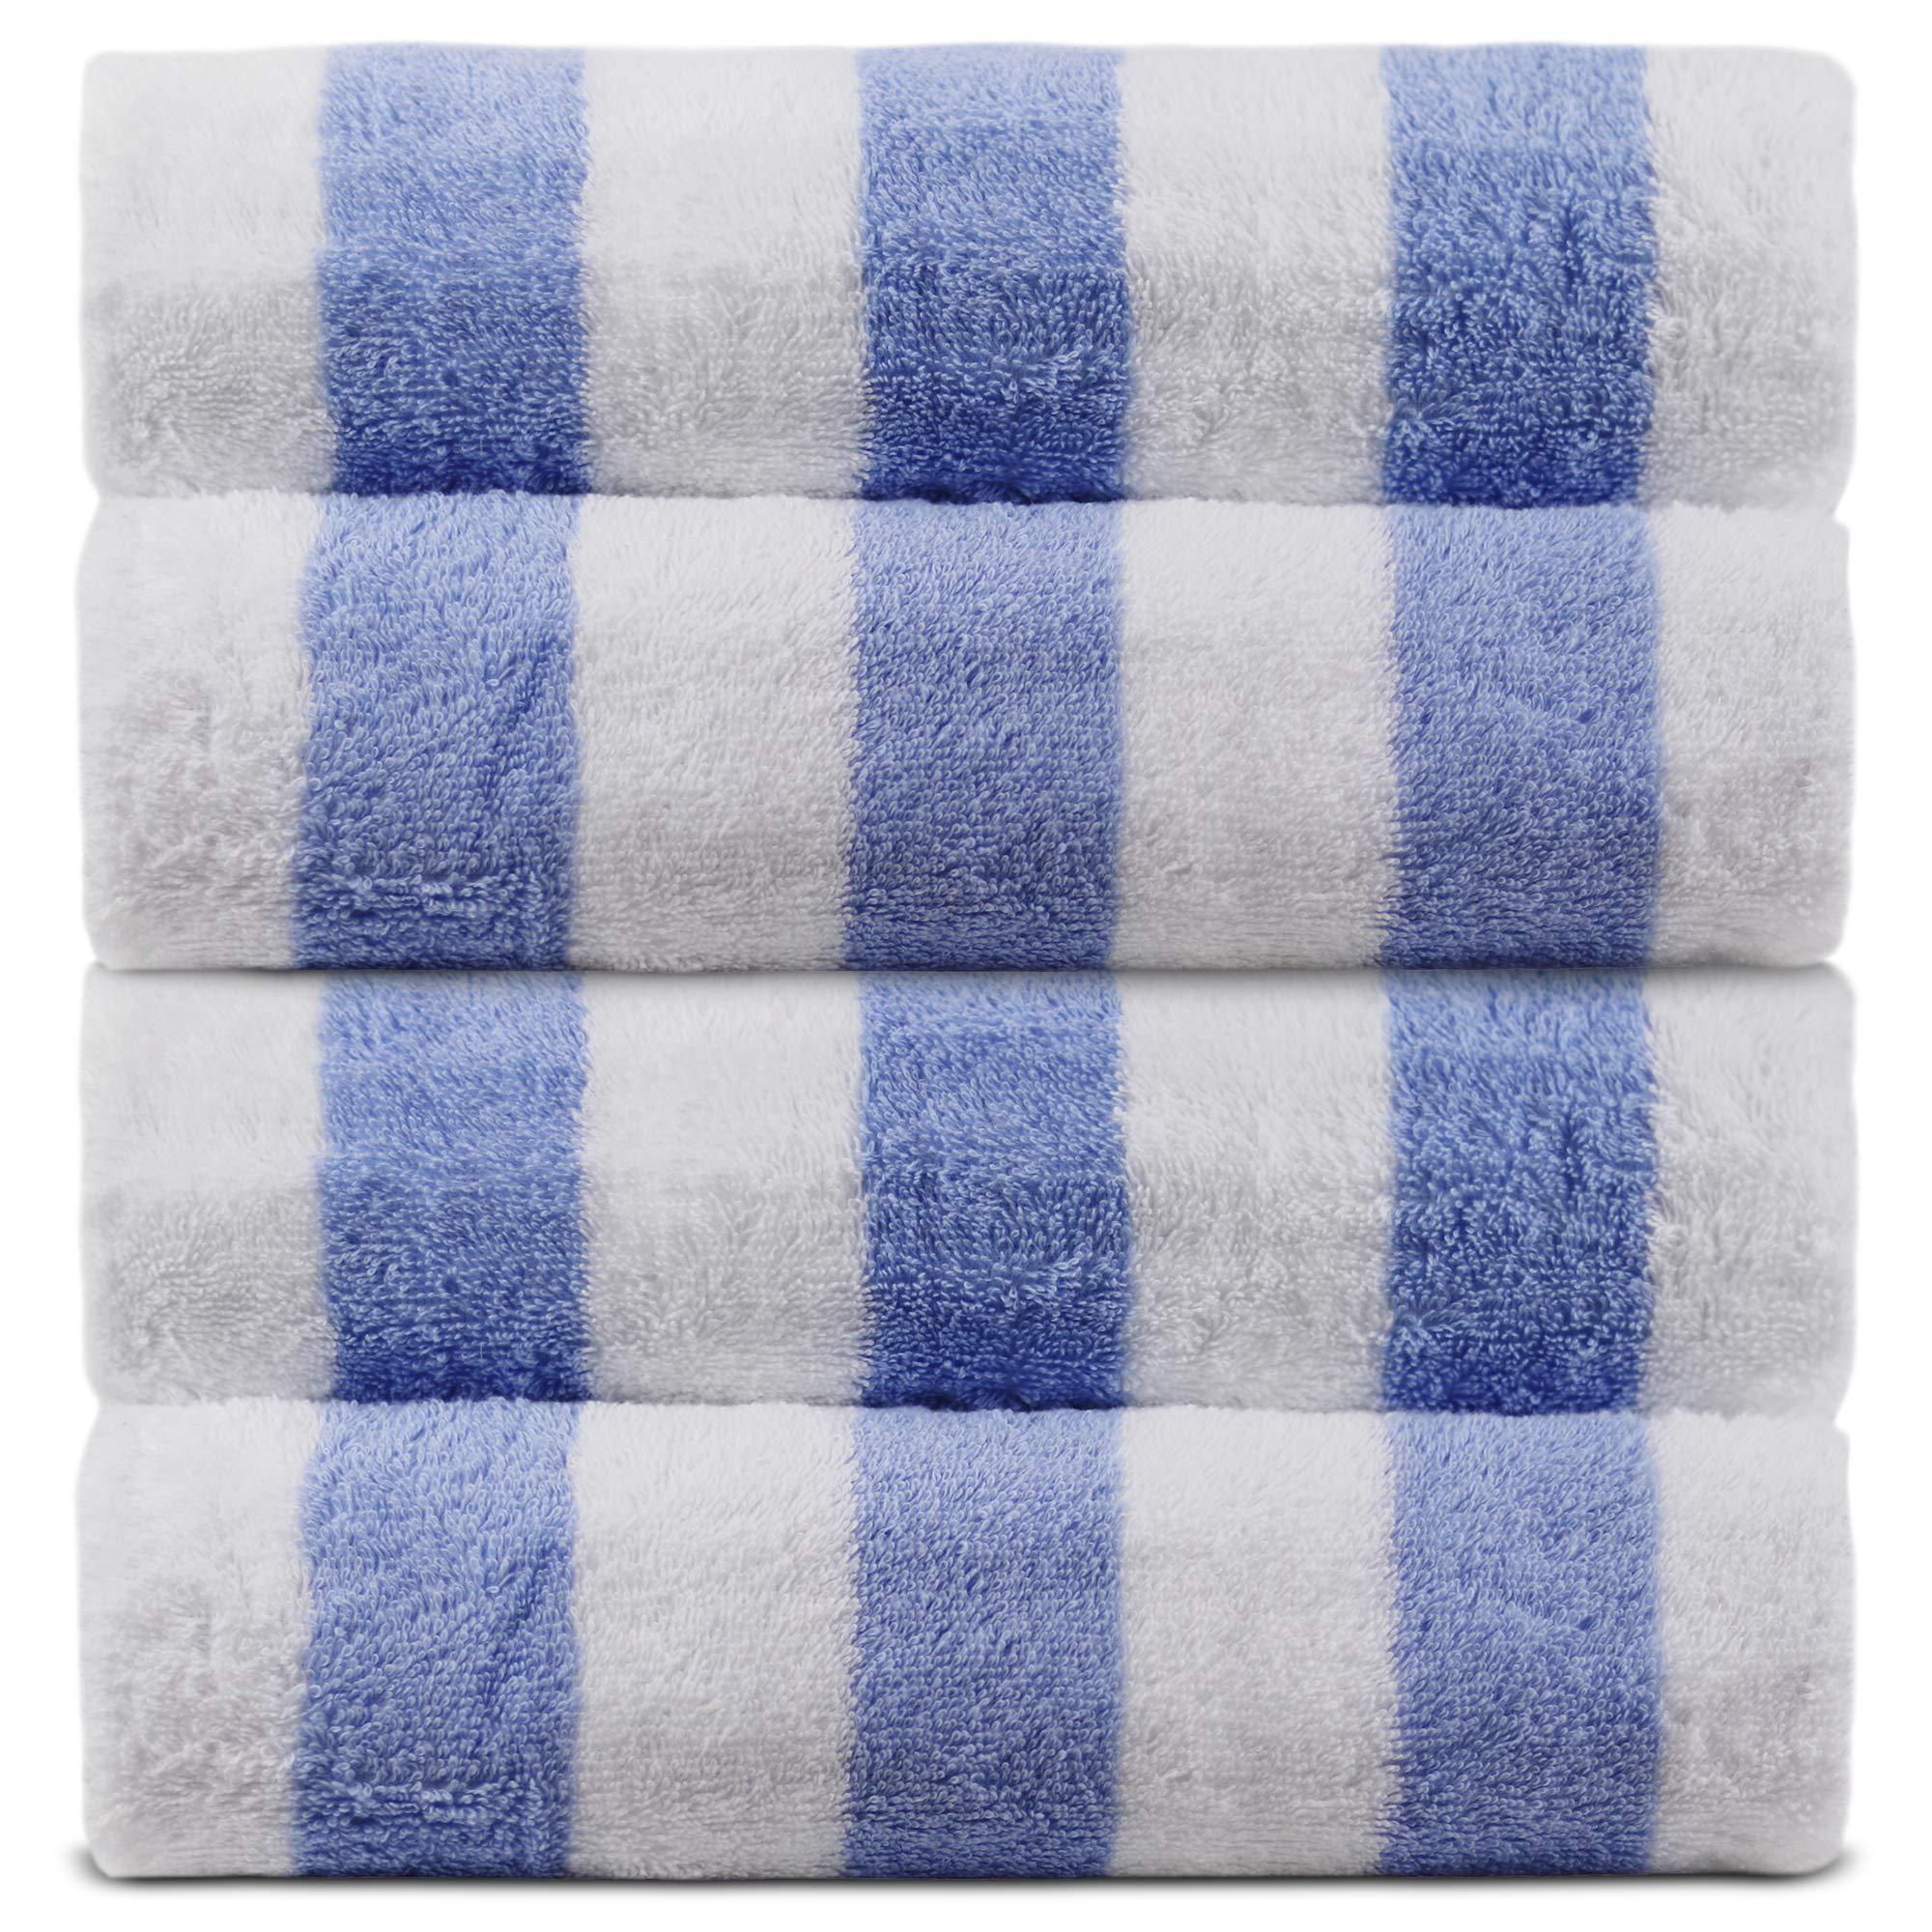 Luxury Hotel & Spa Towel 100% Cotton Pool Beach Towels - Cabana (Cabana Beach Towels - Set of 4, Light Blue)